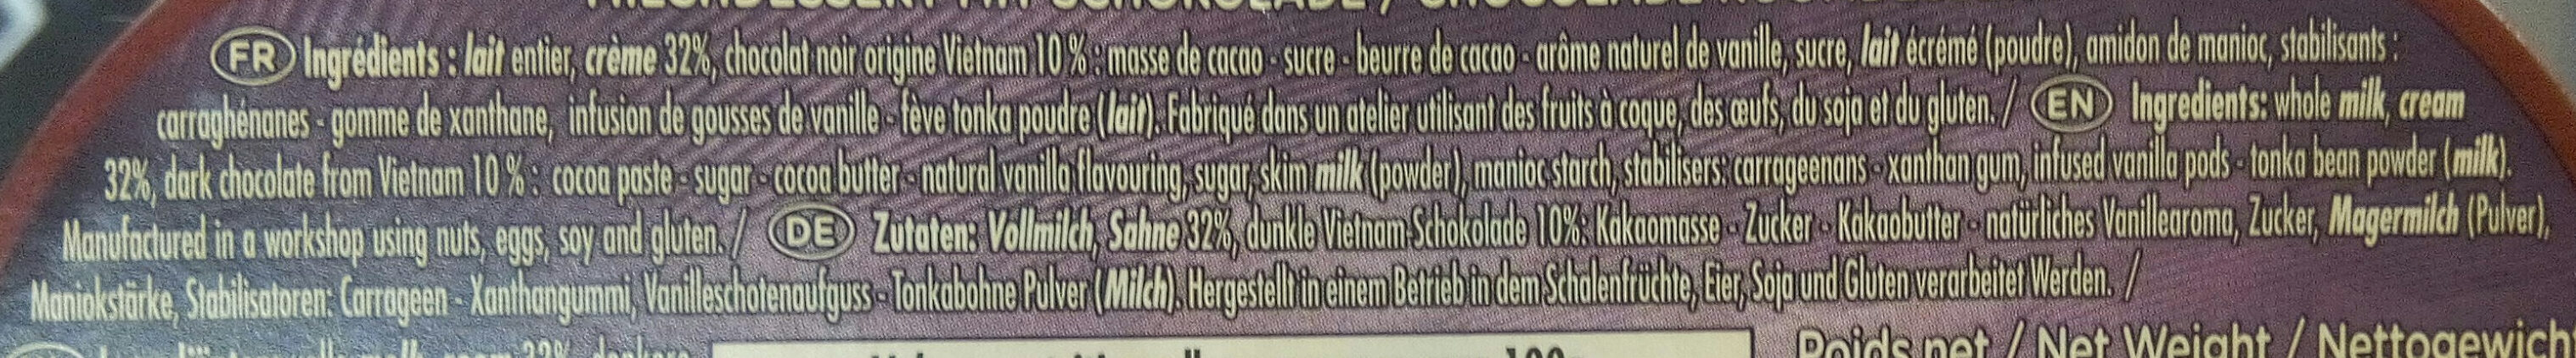 Le Liégeois au Chocolat - Ingrediënten - fr